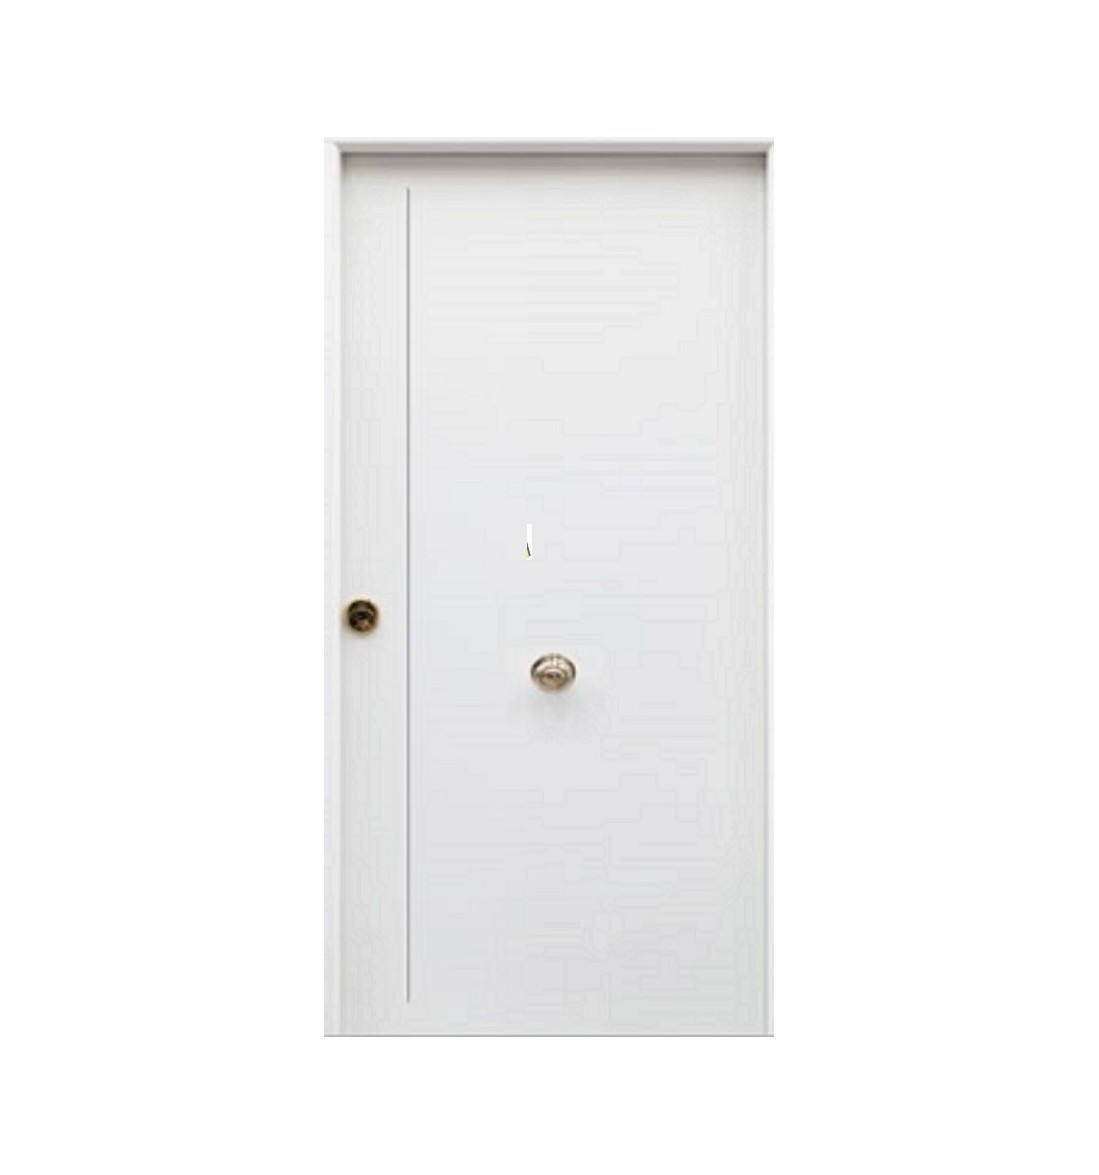 Puerta Seguridad 900x2100 Mod. Ixora